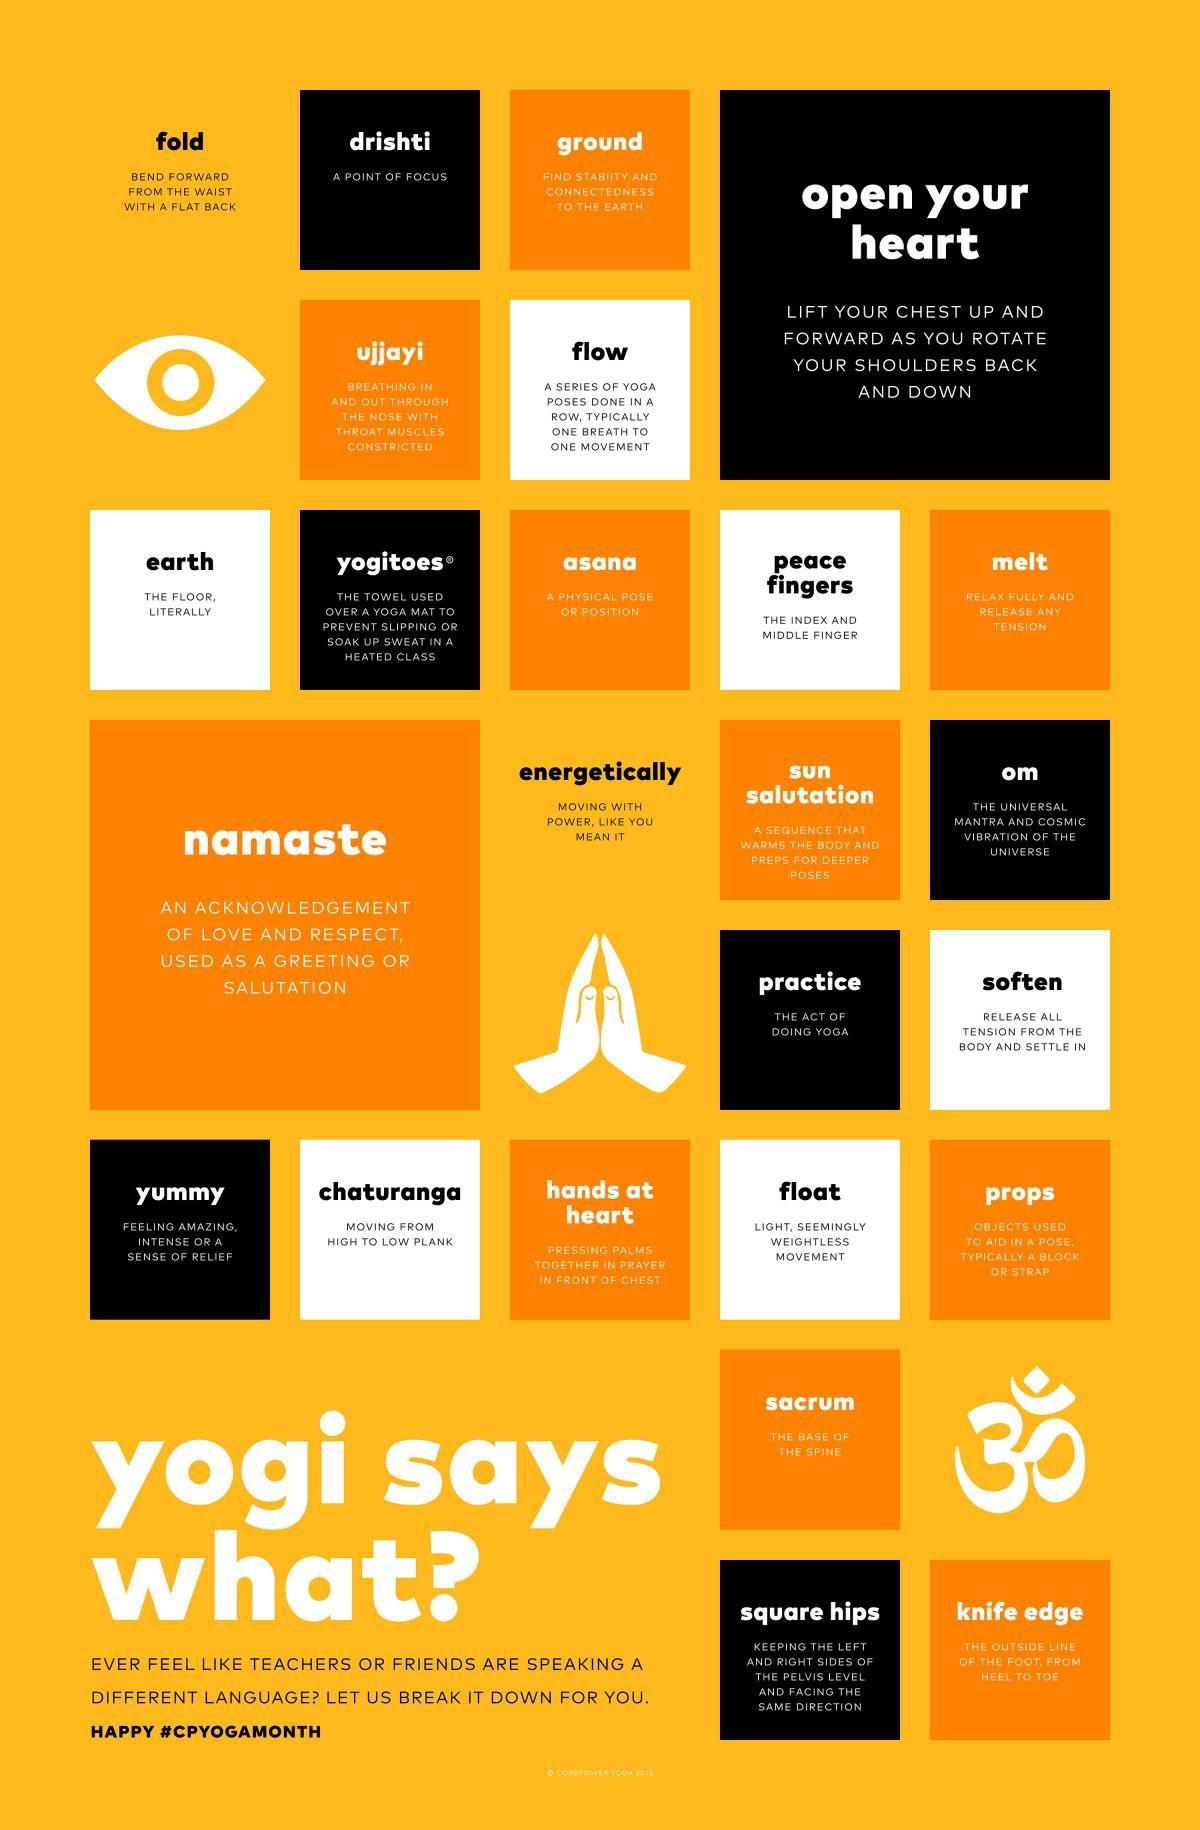 Yogi Says What   CorePower Yoga